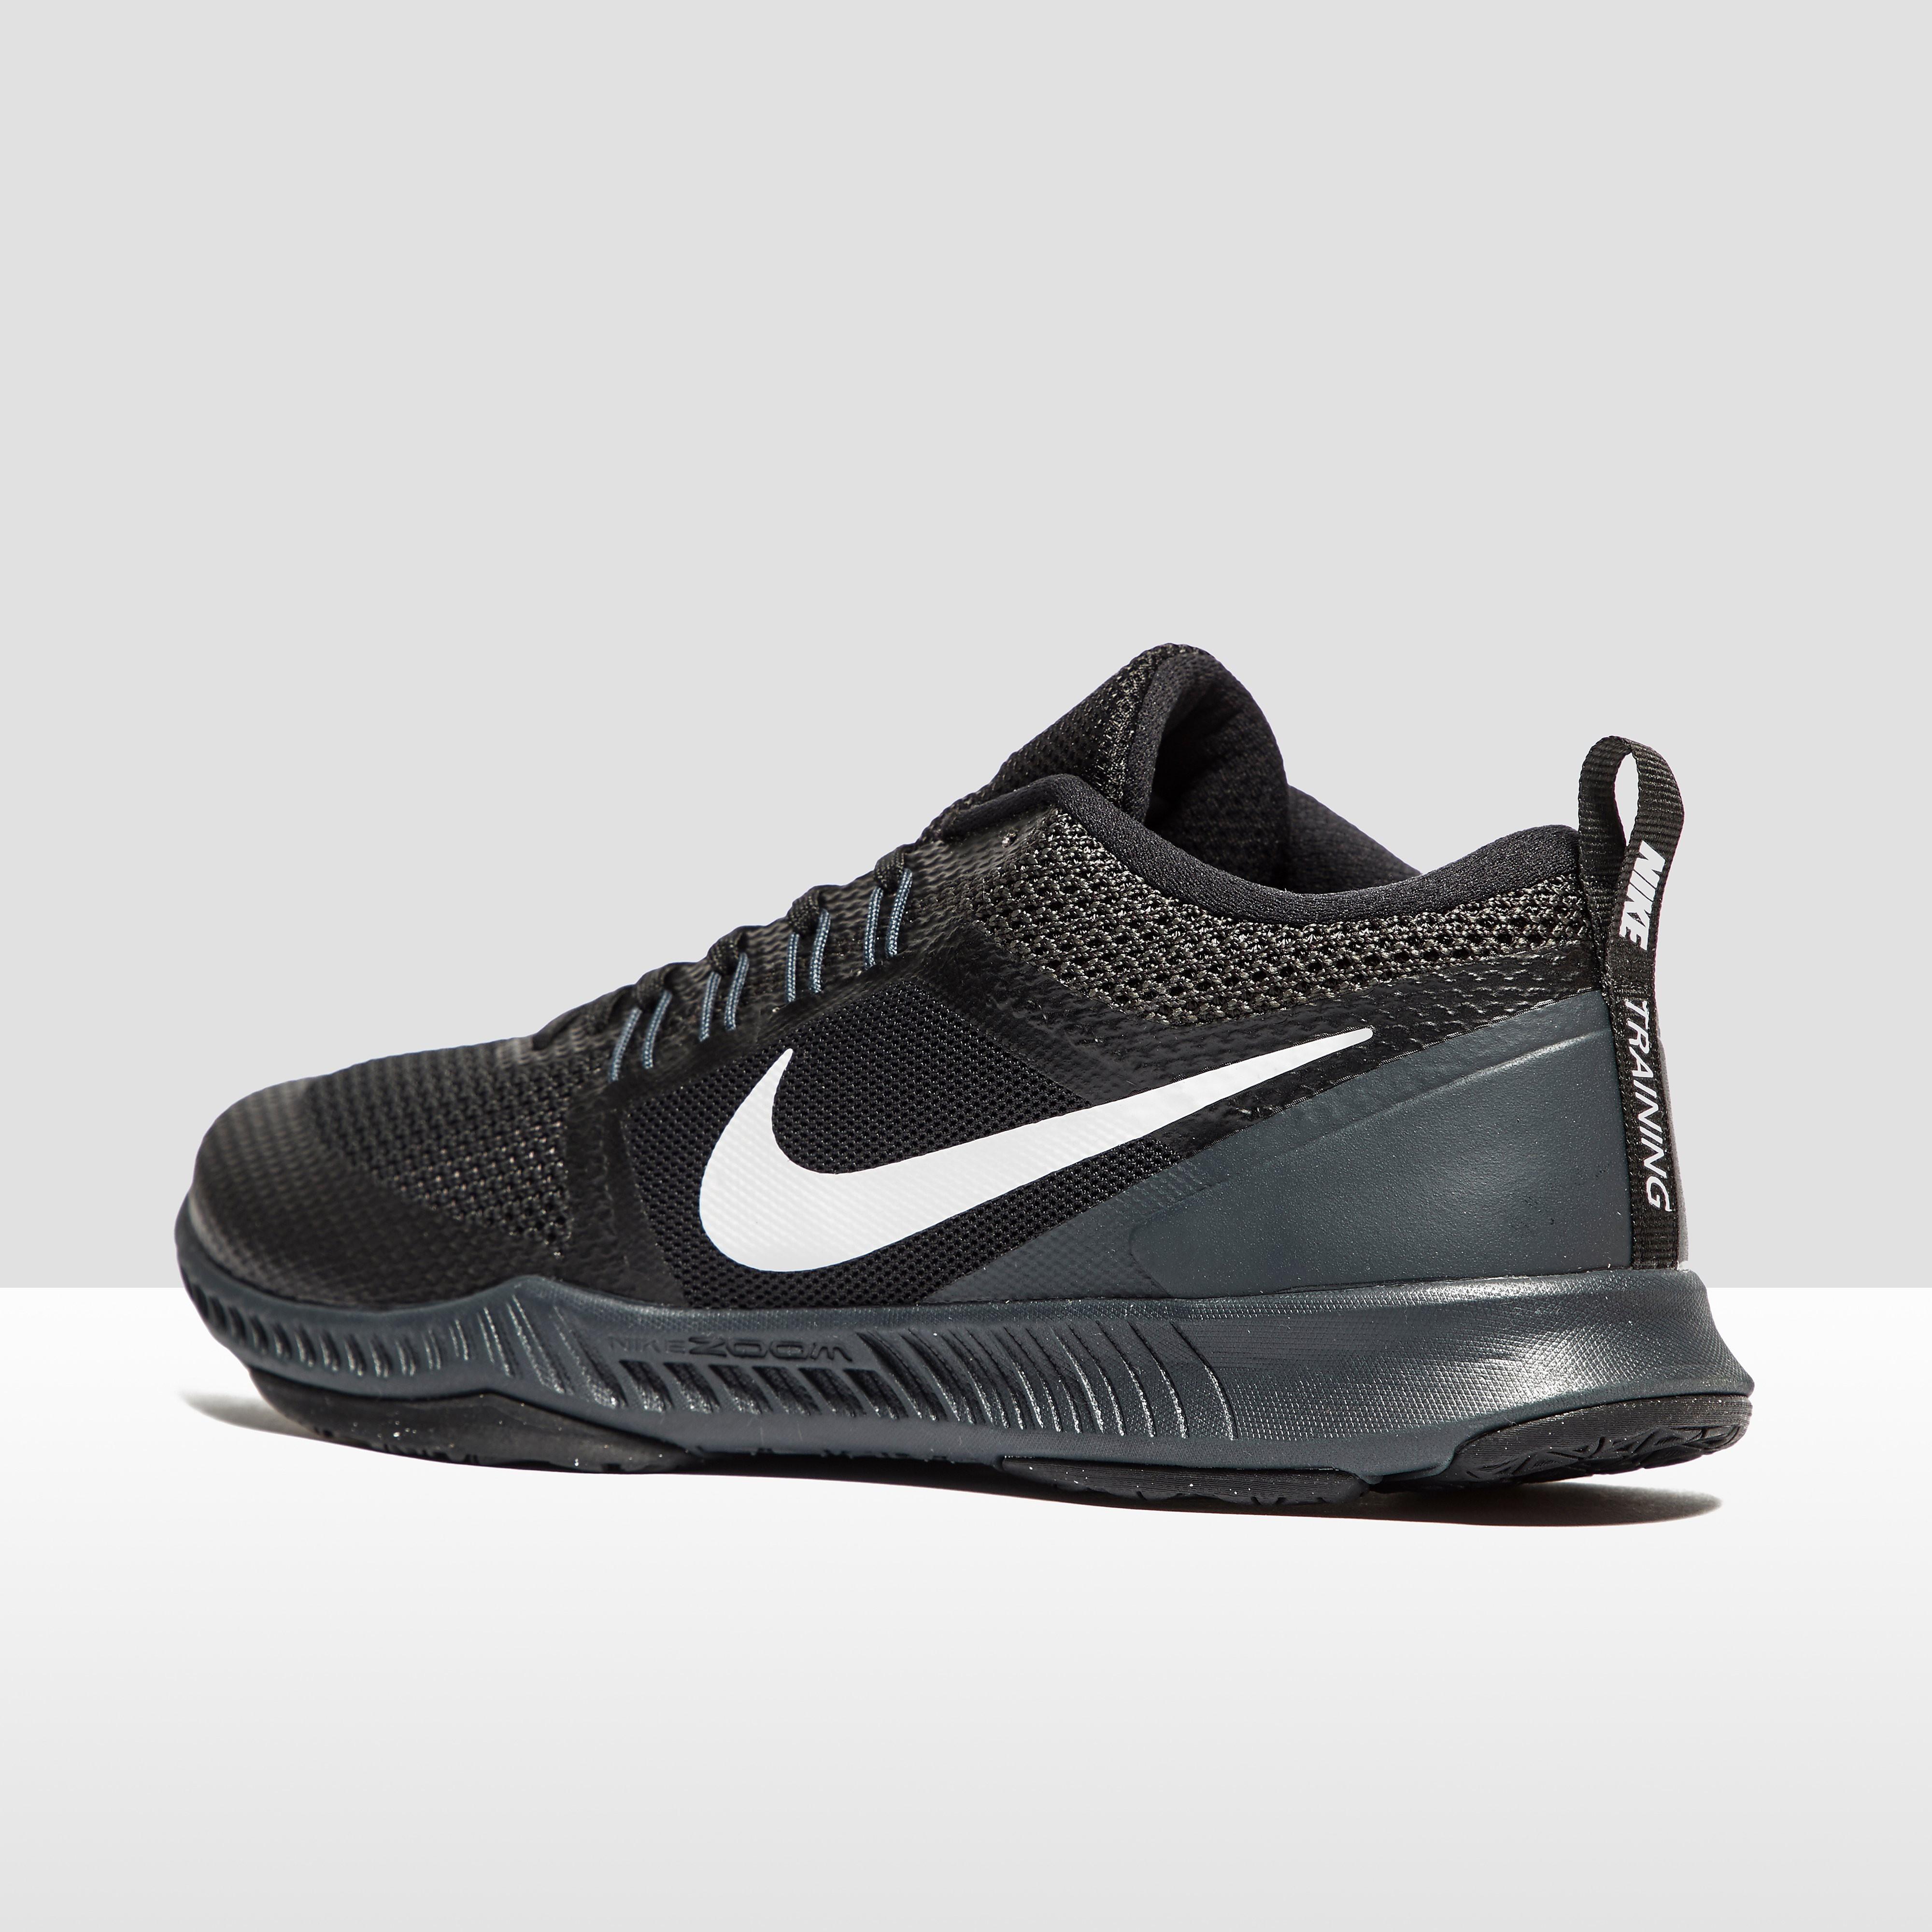 Nike Zoom Domination Men's Training Shoes